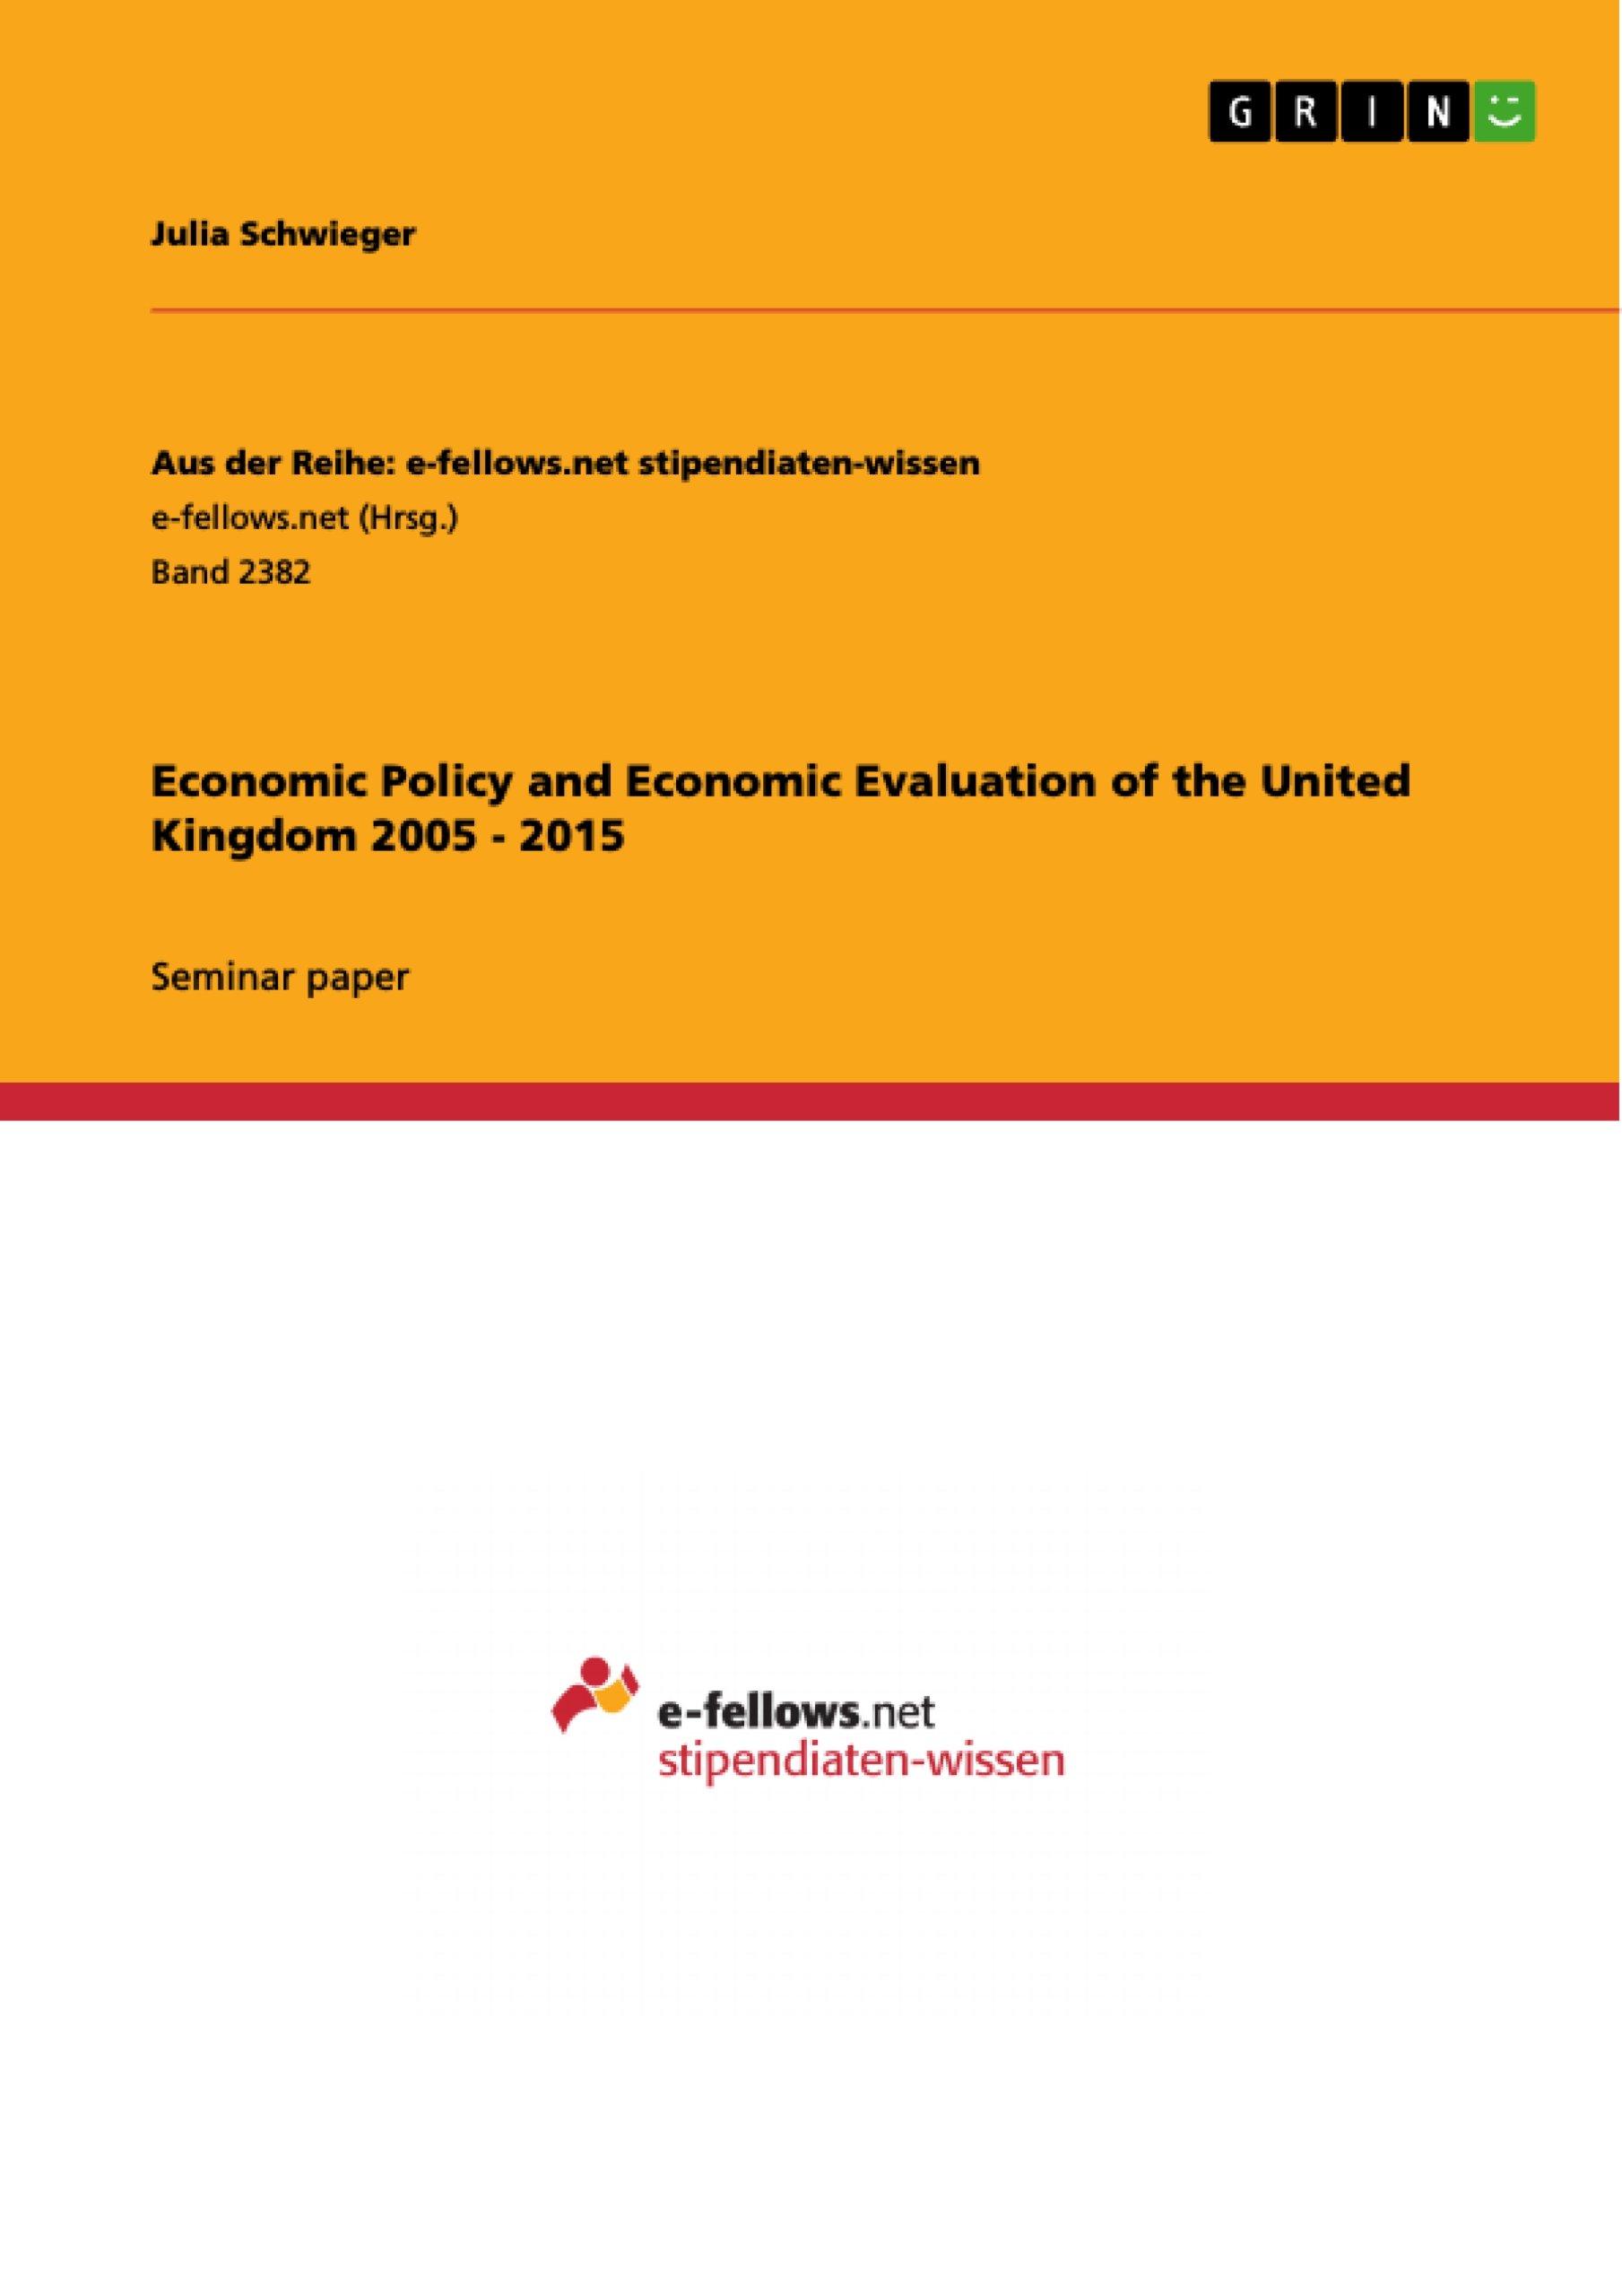 Economic Policy and Economic Evaluation of the United Kingdom 2005 - 2015